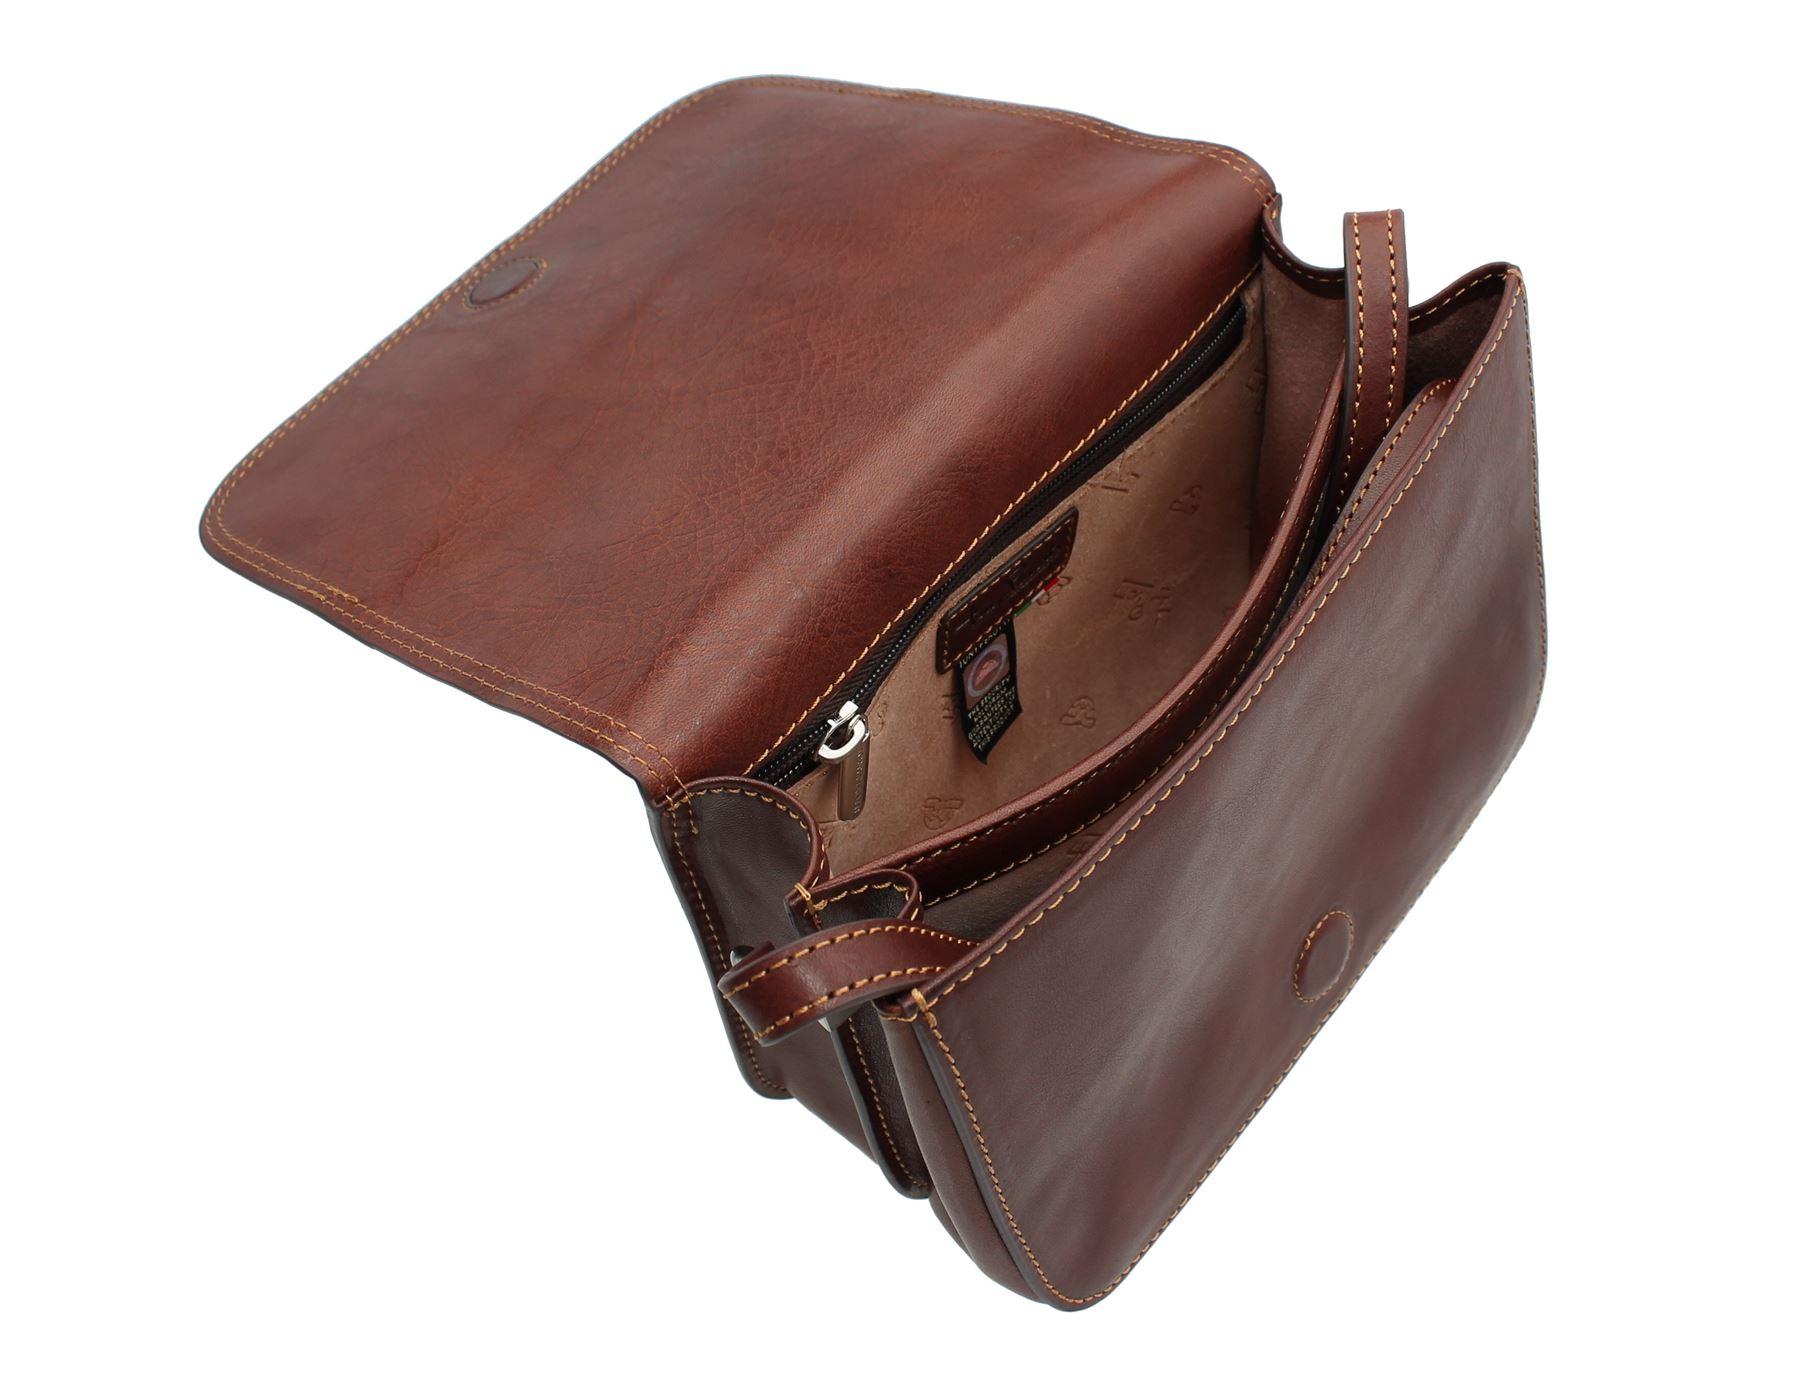 9ec513cae5 Tony Perotti Full Grain Leather Messenger / Shoulder Bag 1818_1   eBay